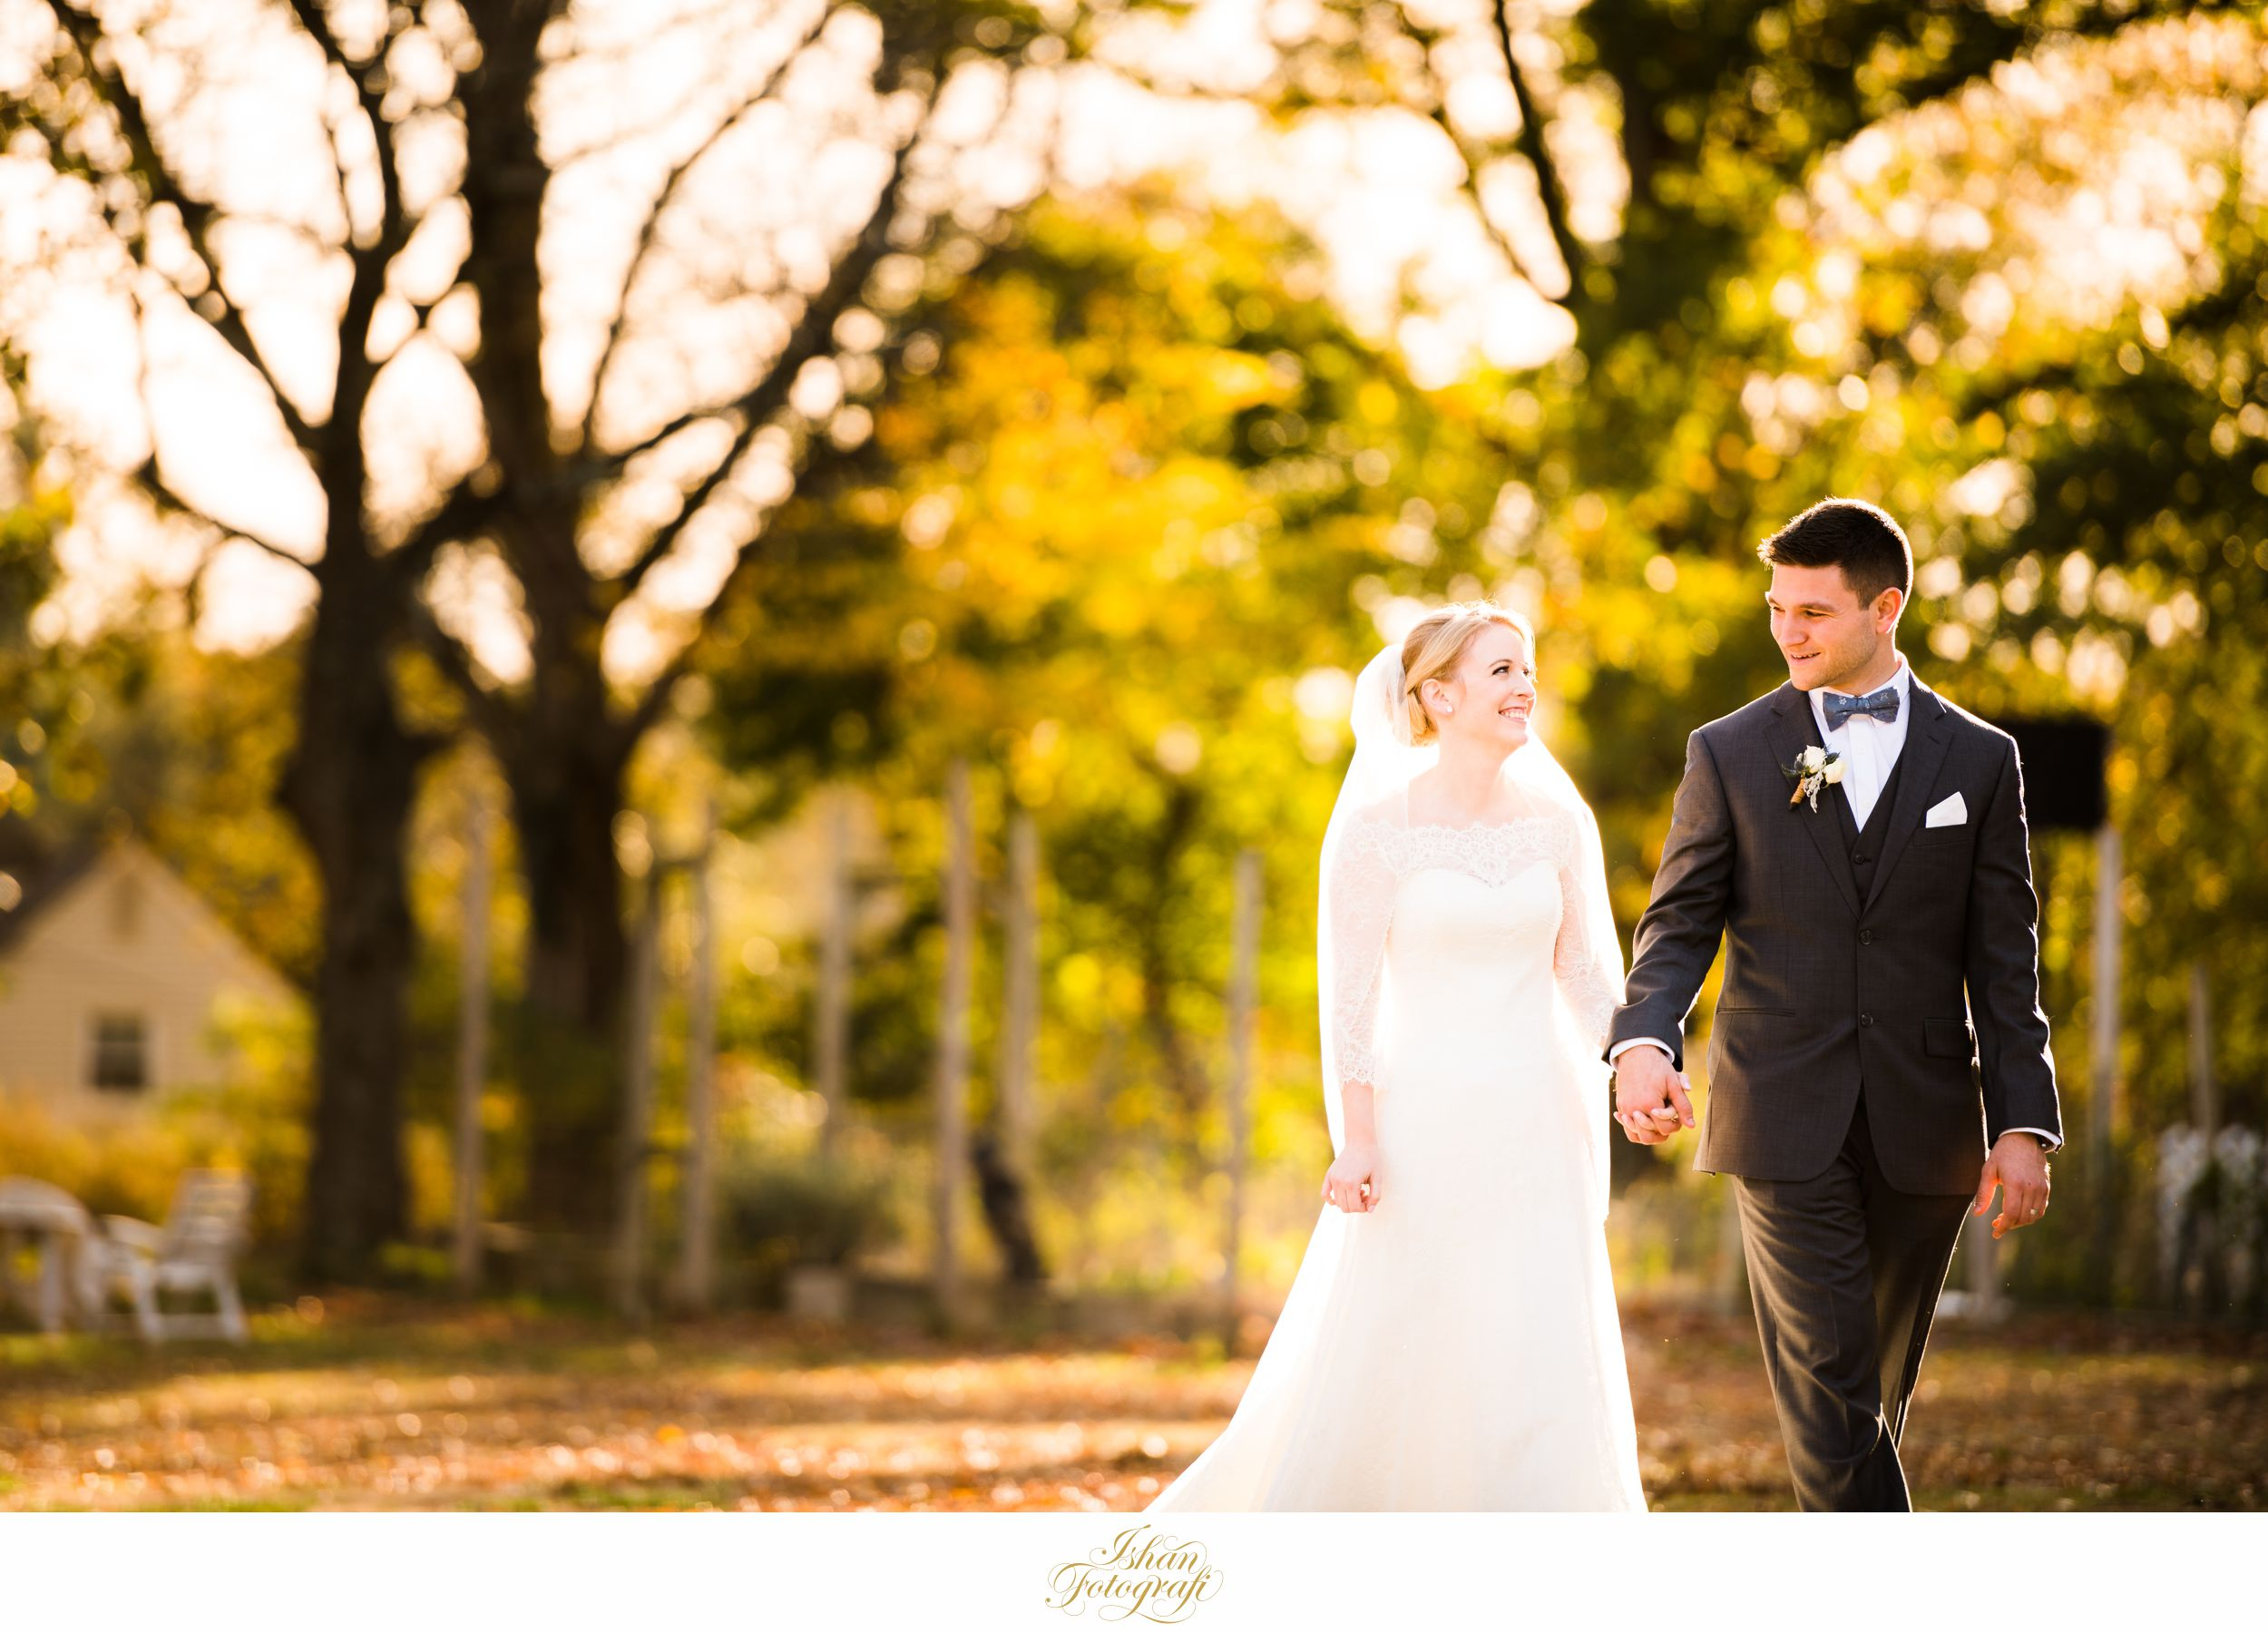 davids-country-inn-wedding-photographer